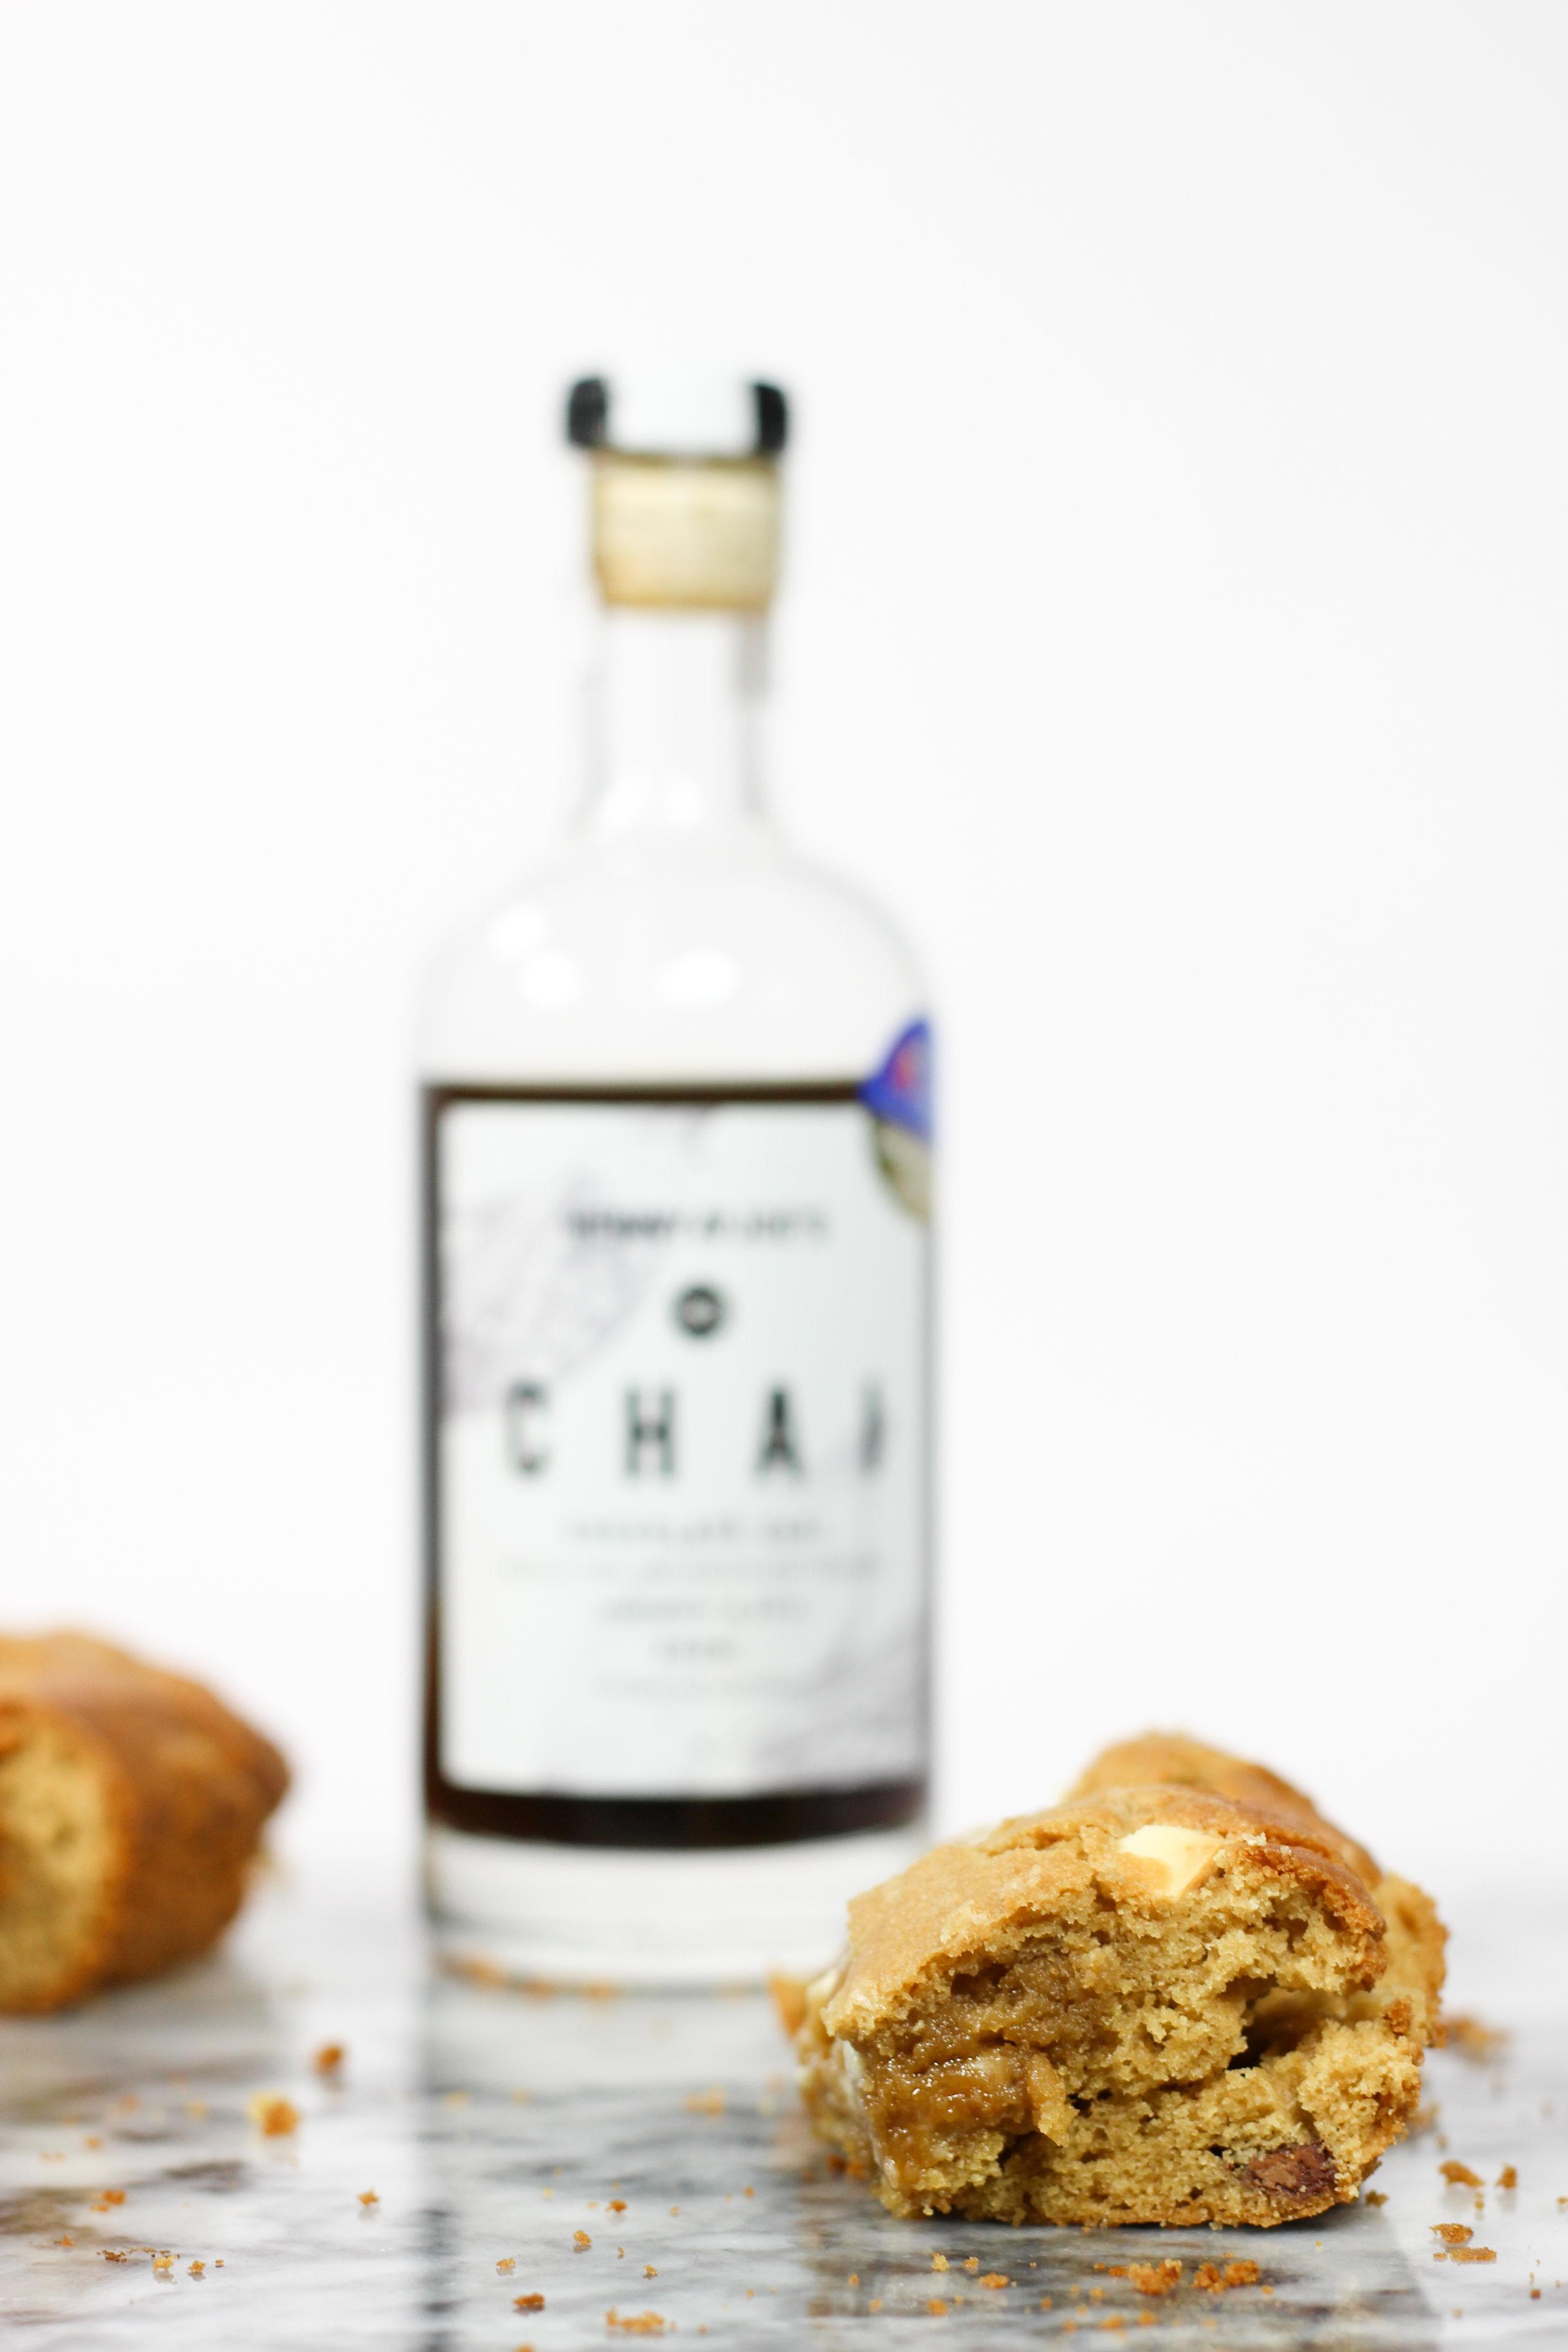 Henny & Joes Chai Chocolate Syrup Recipe